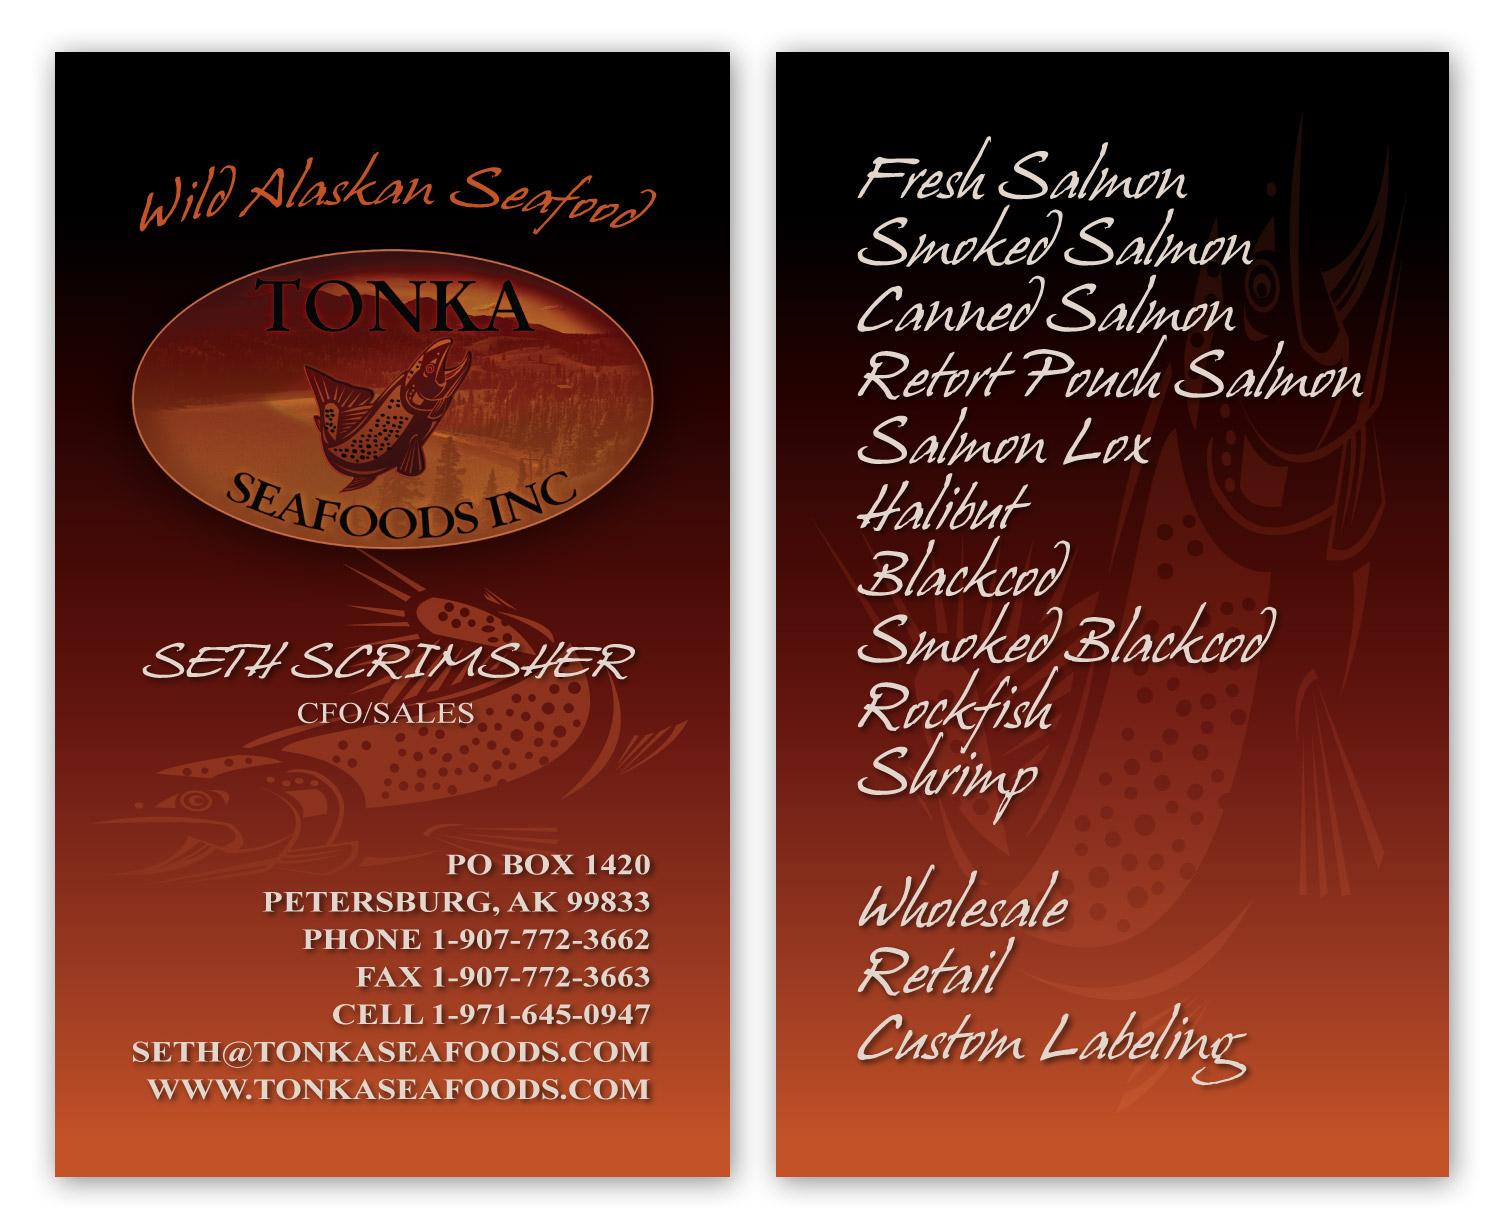 Tonka seafoods business cards nashville graphic designer published june 14 2010 categories business card design reheart Gallery